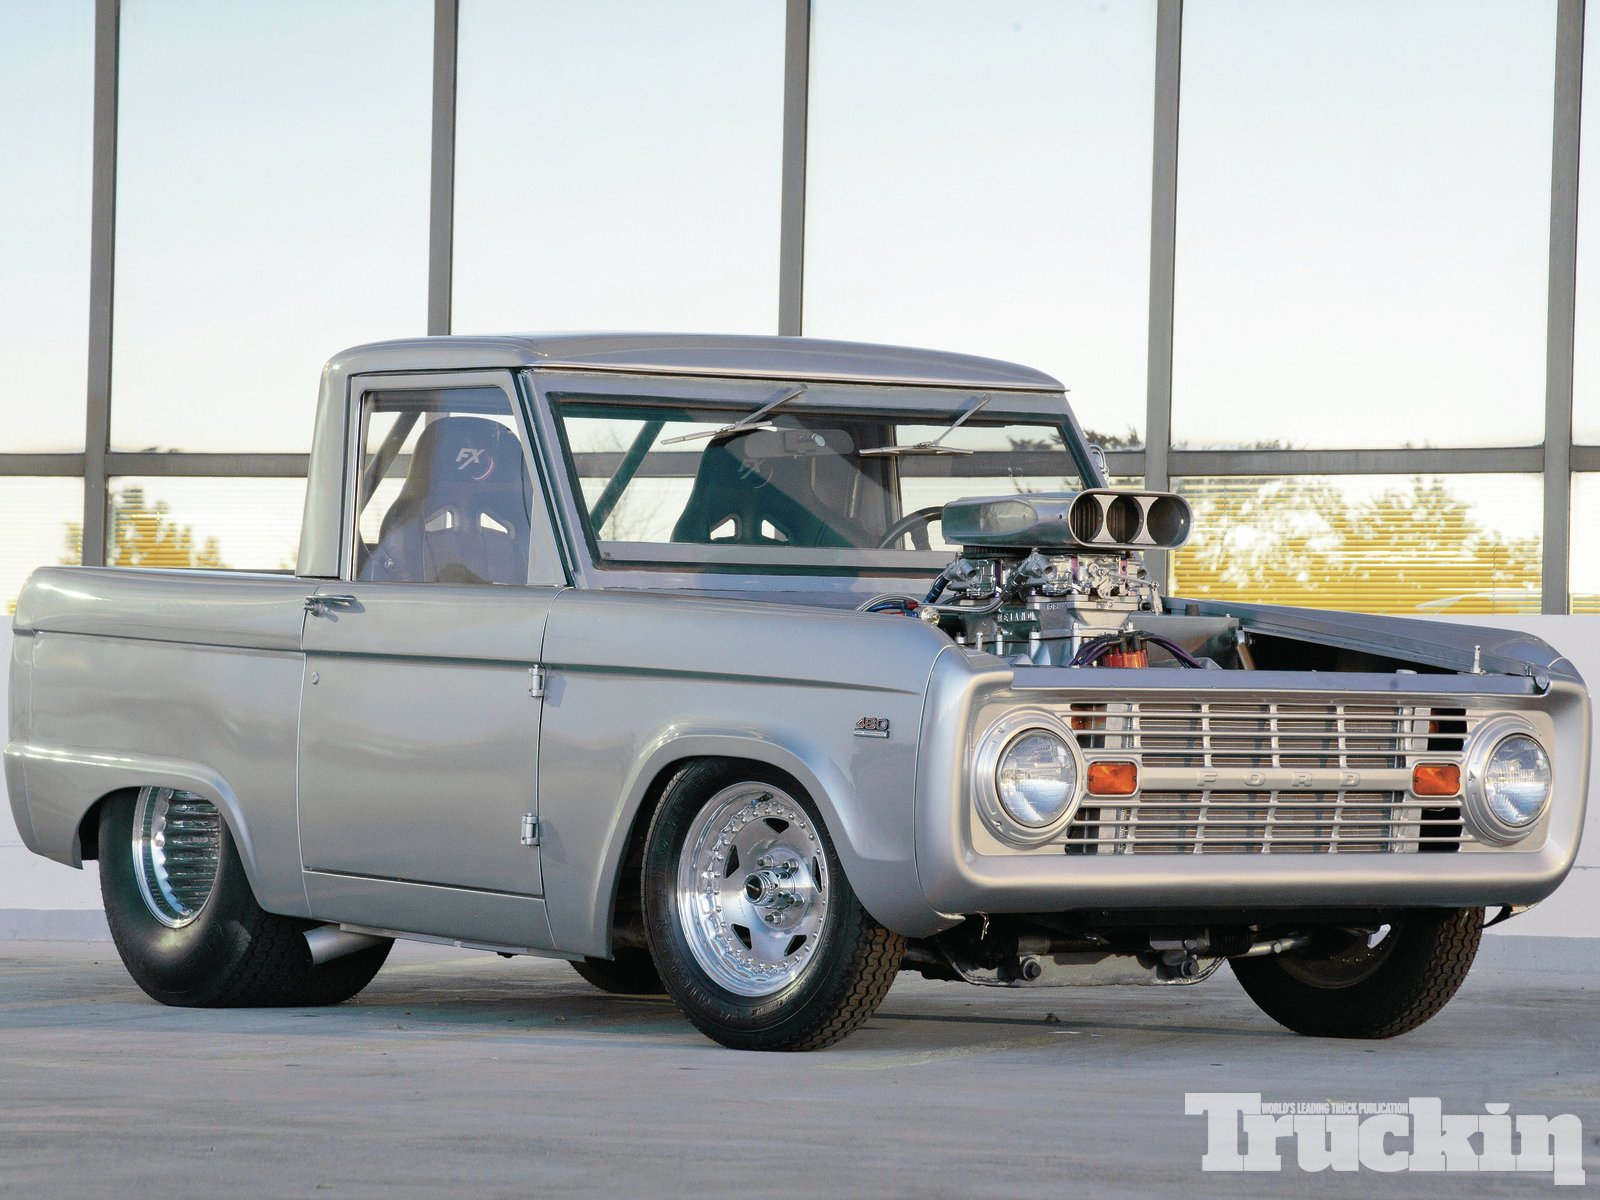 Ford Ranger 4x4 2000 >> FORD BRONCO suv 4x4 truck lowrider custom hot rod rods drag race racing wallpaper | 1600x1200 ...